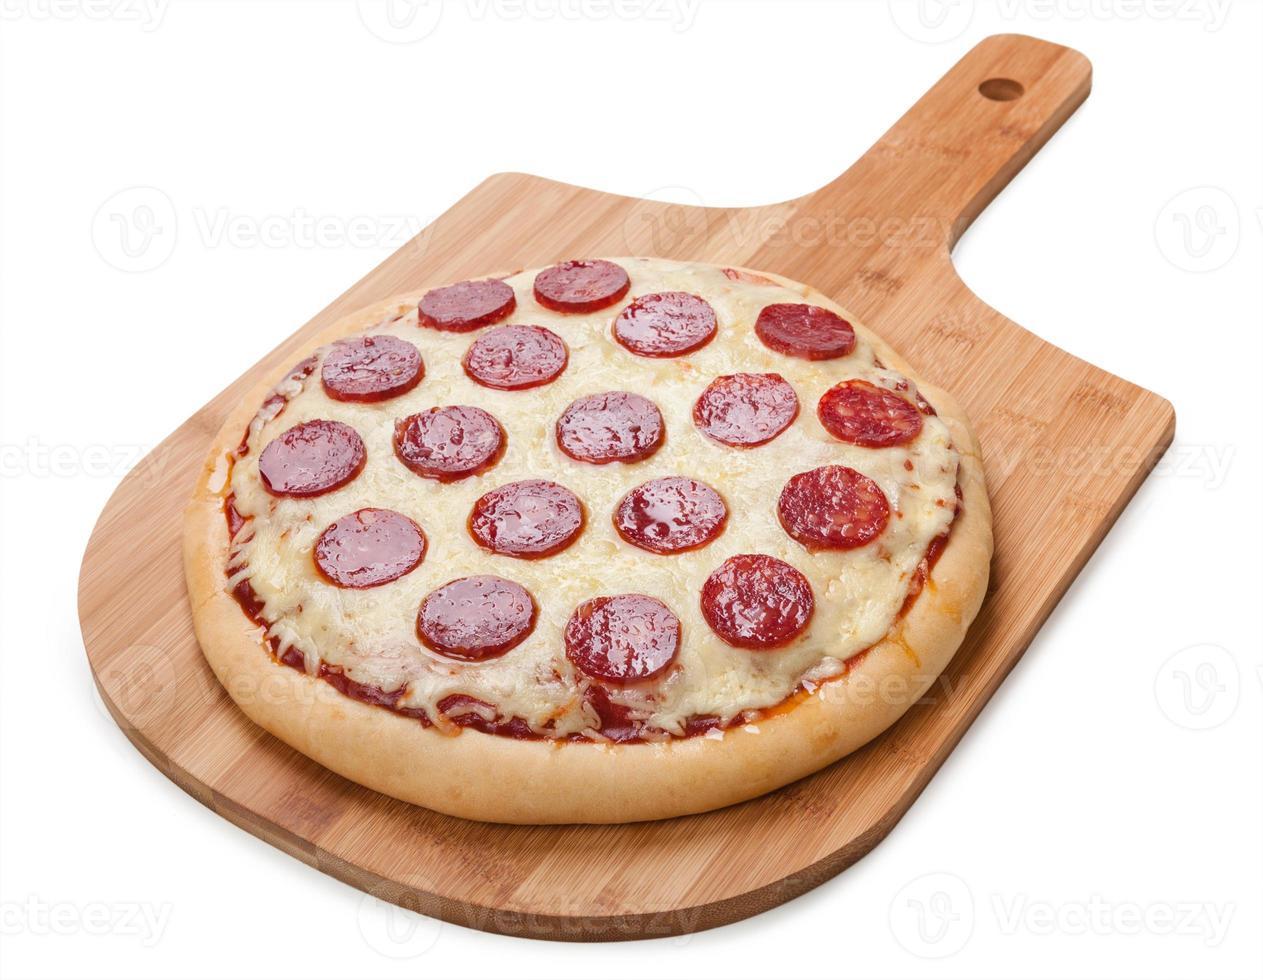 färsk smakrik pepperonipizza isolerad på vit bakgrund foto